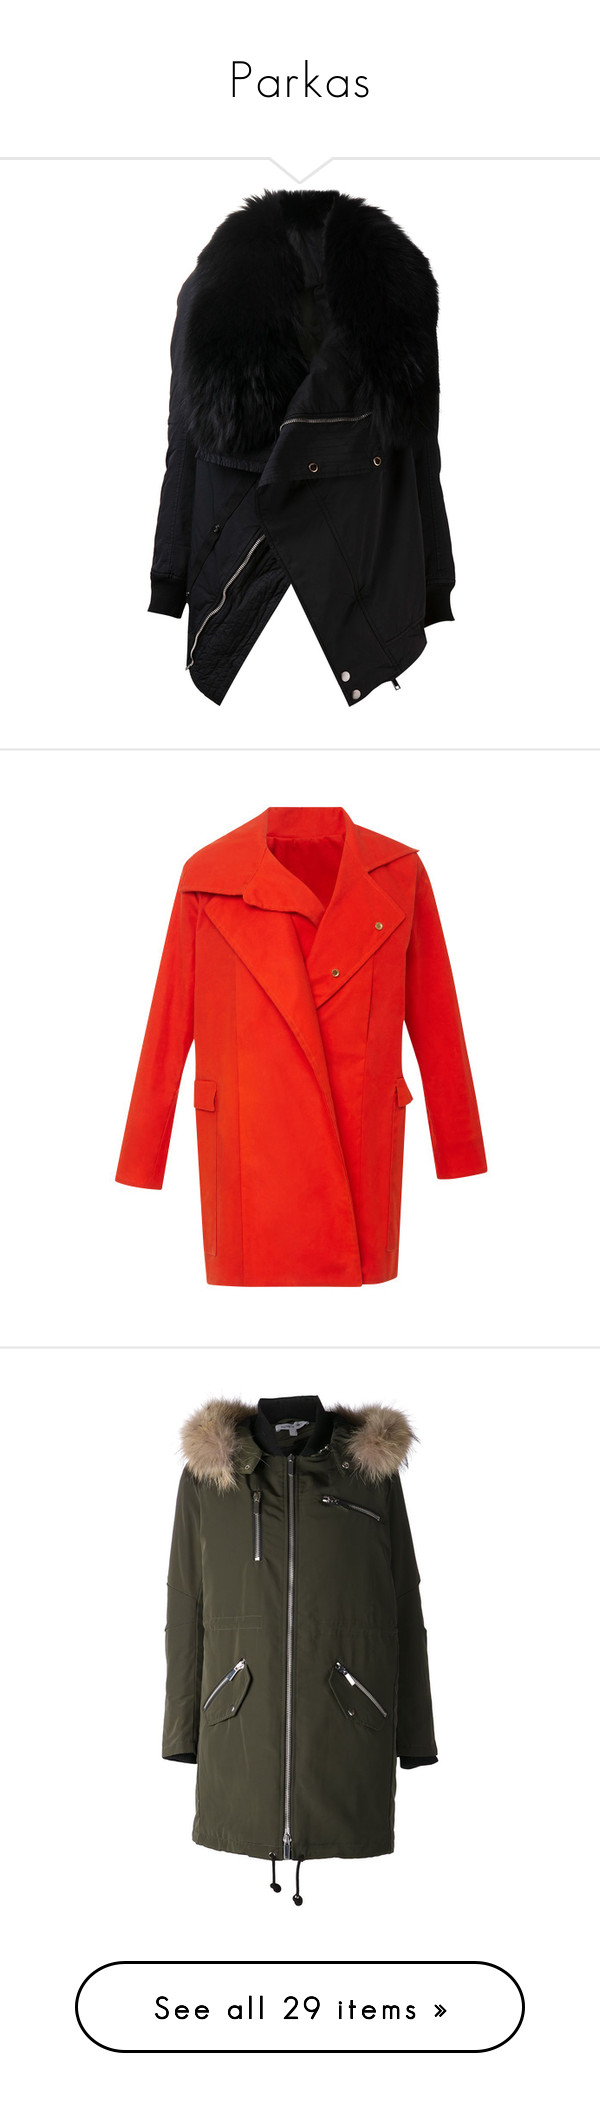 """Parkas"" by carolines-closet ❤ liked on Polyvore featuring outerwear, coats, jackets, fur, tops, fur parka coat, long sleeve coat, fur collar coat, drkshdw and parka coats"